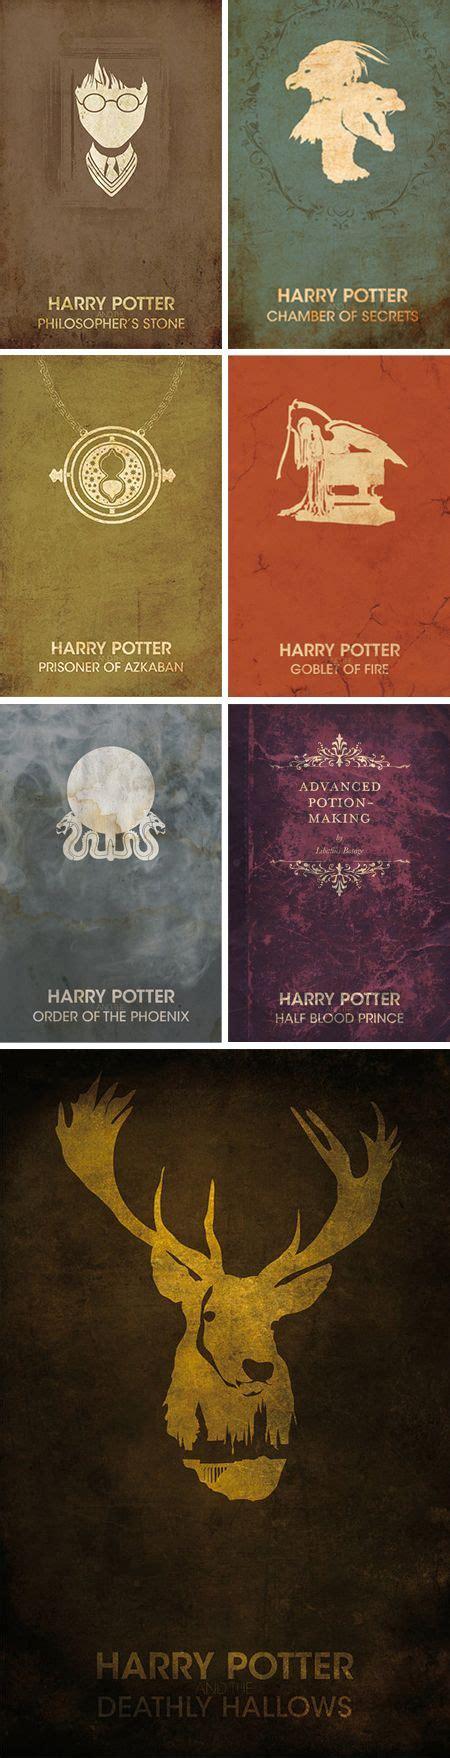 libro three classic novels sense 78 mejores im 225 genes de harry potter en hogwarts libros de harry potter y accesorios